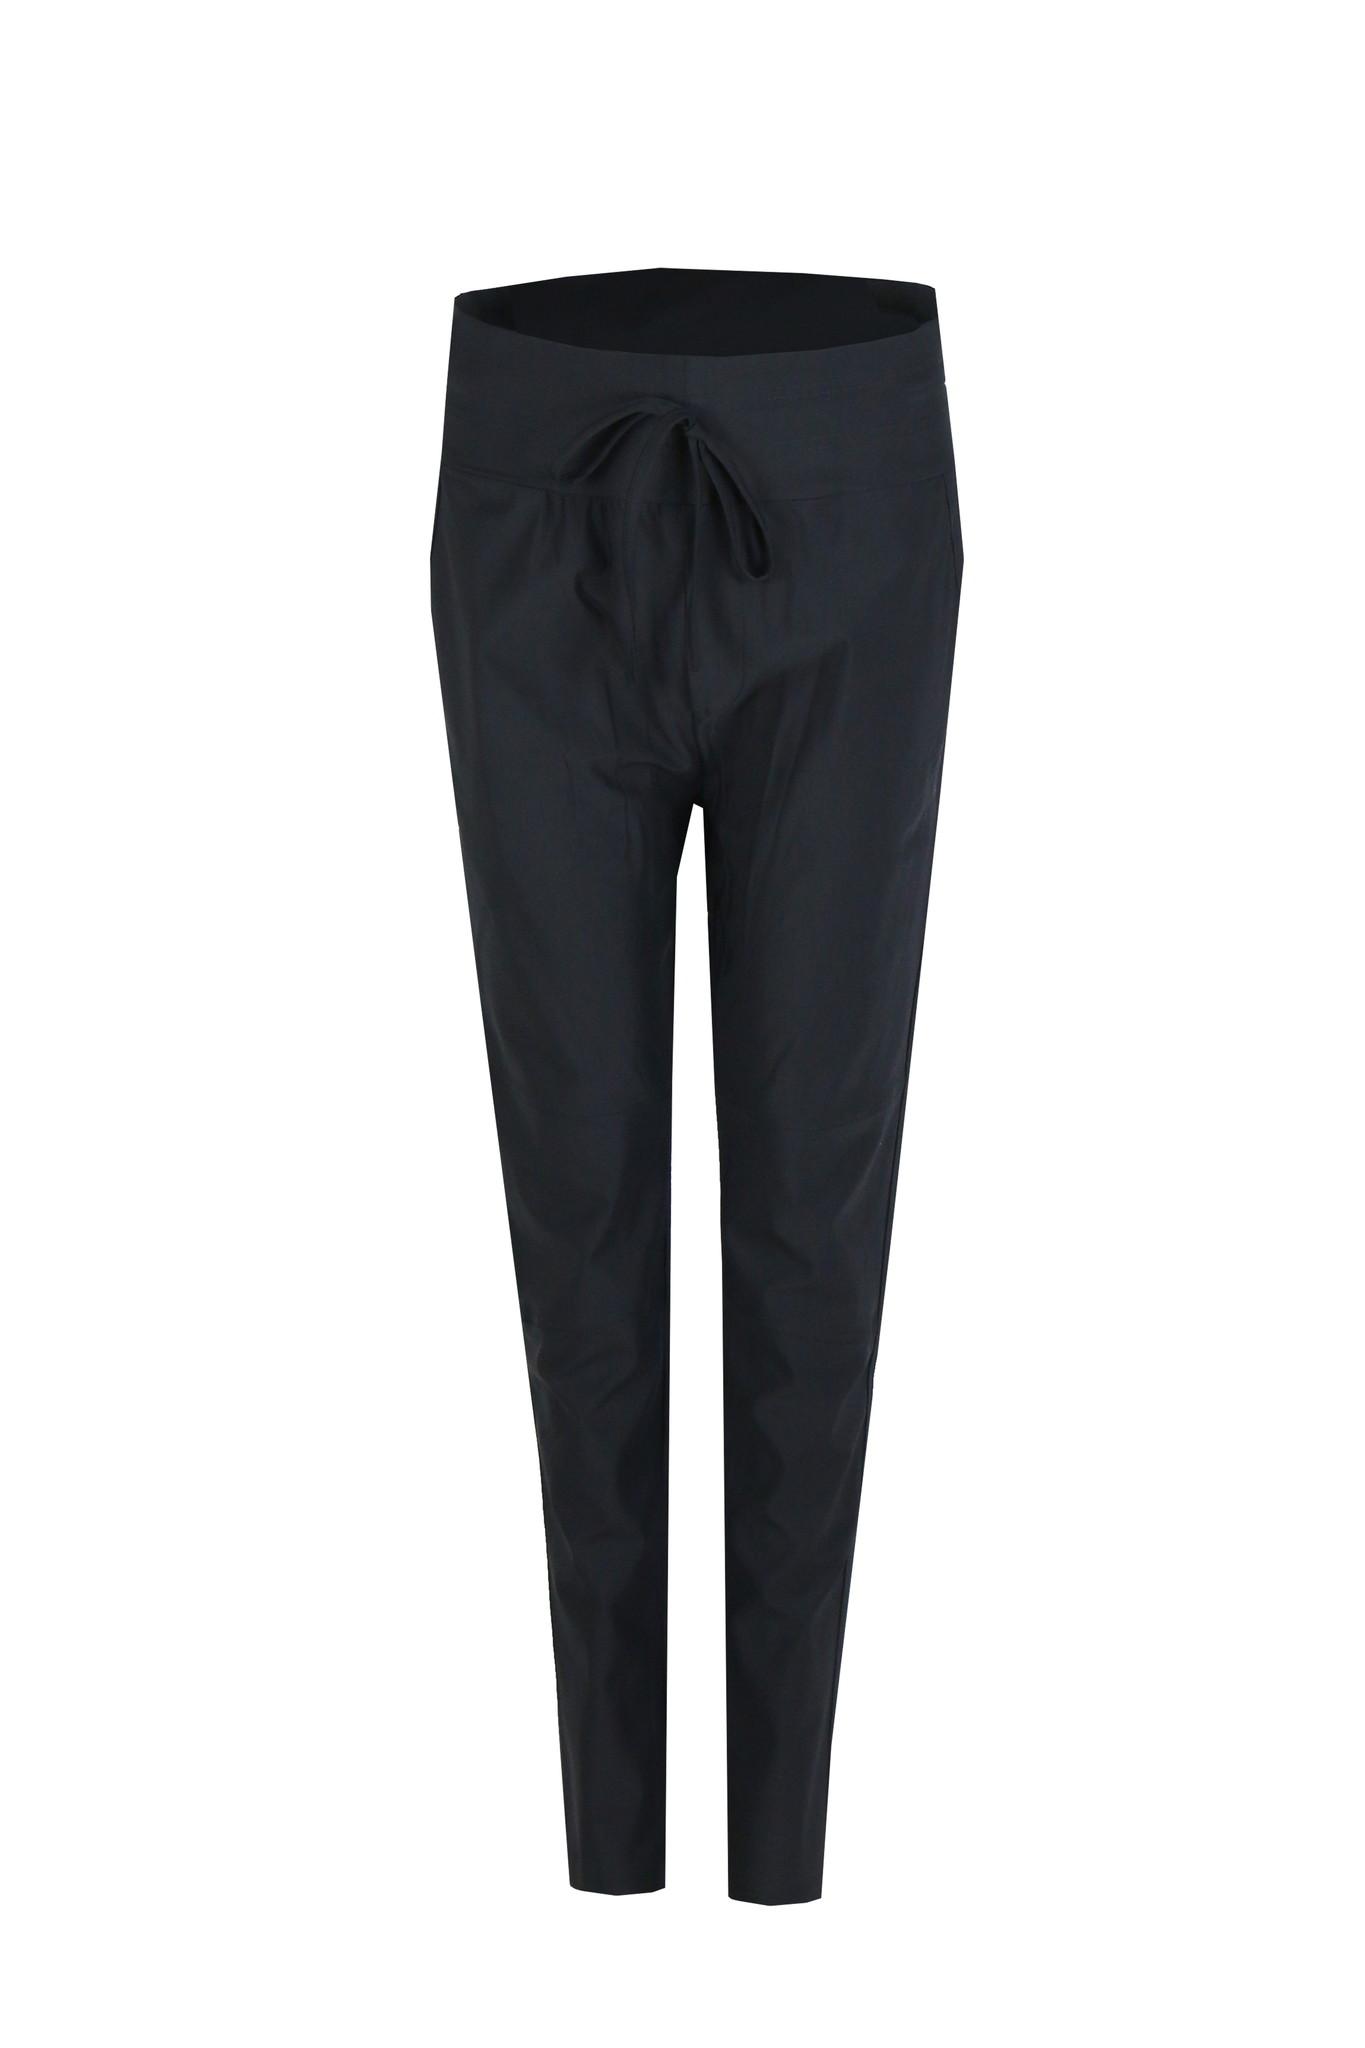 G-Maxx G-maxx Tiffany broek zwart